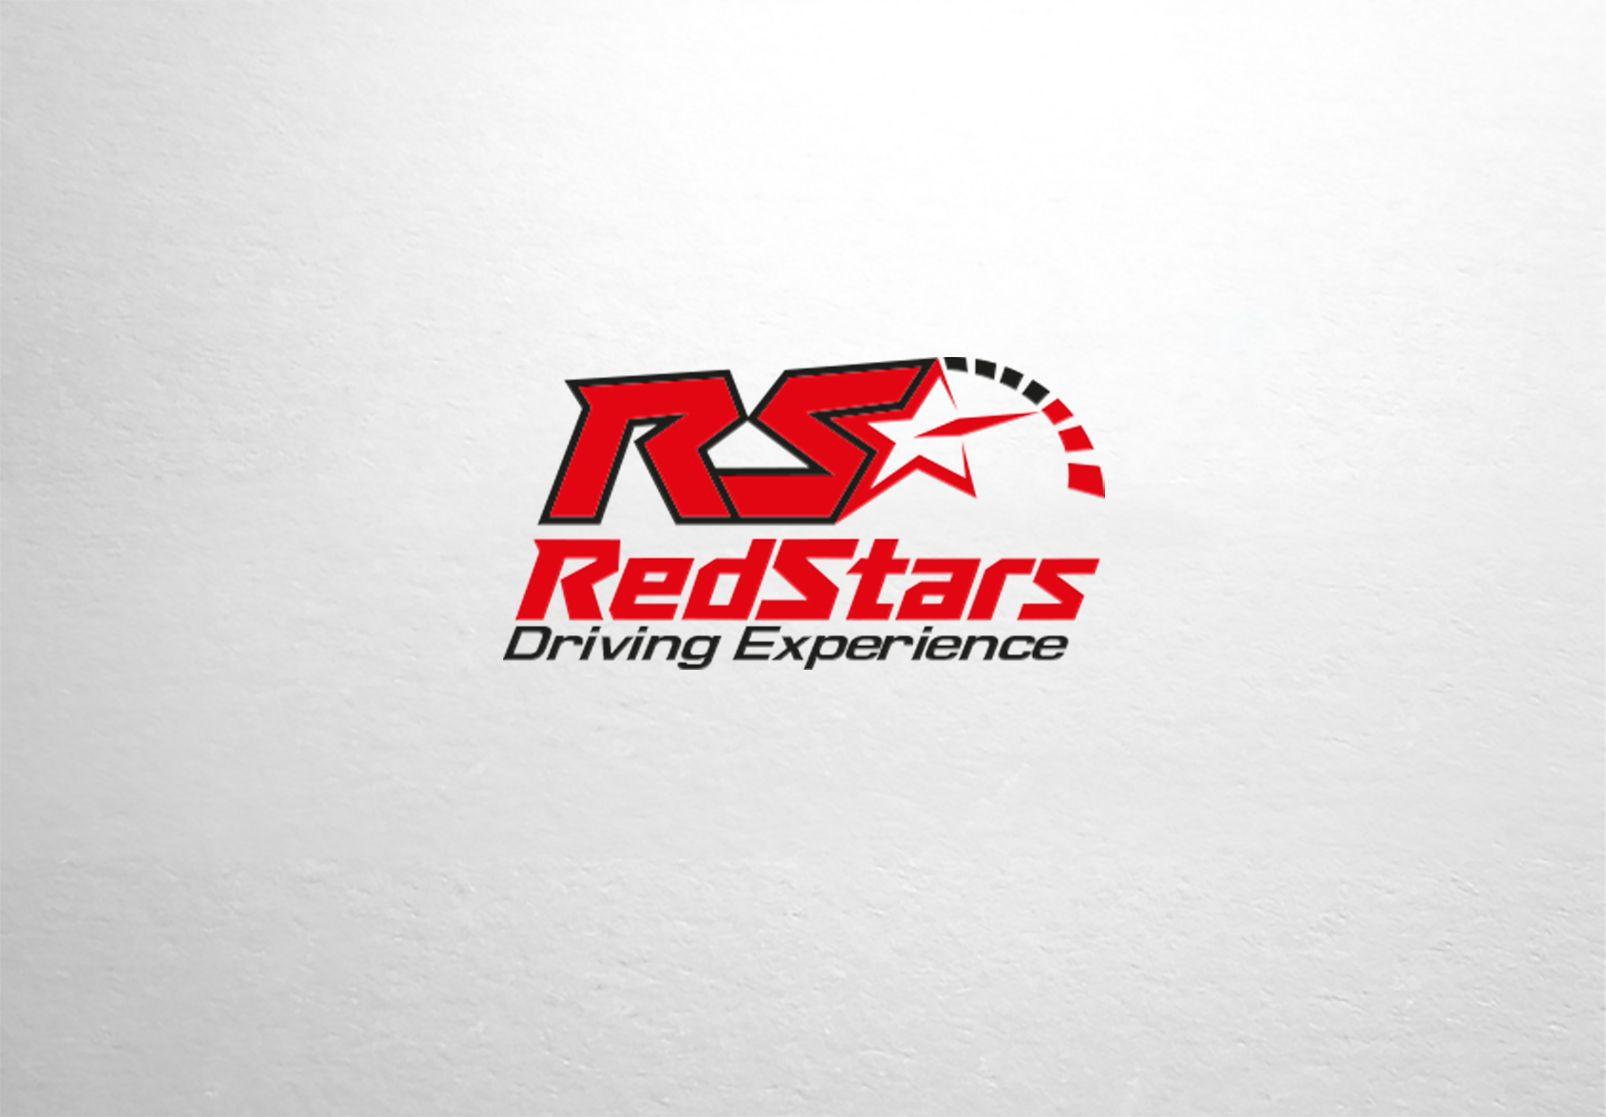 Логотип для компании (автоспорт) - дизайнер dron55